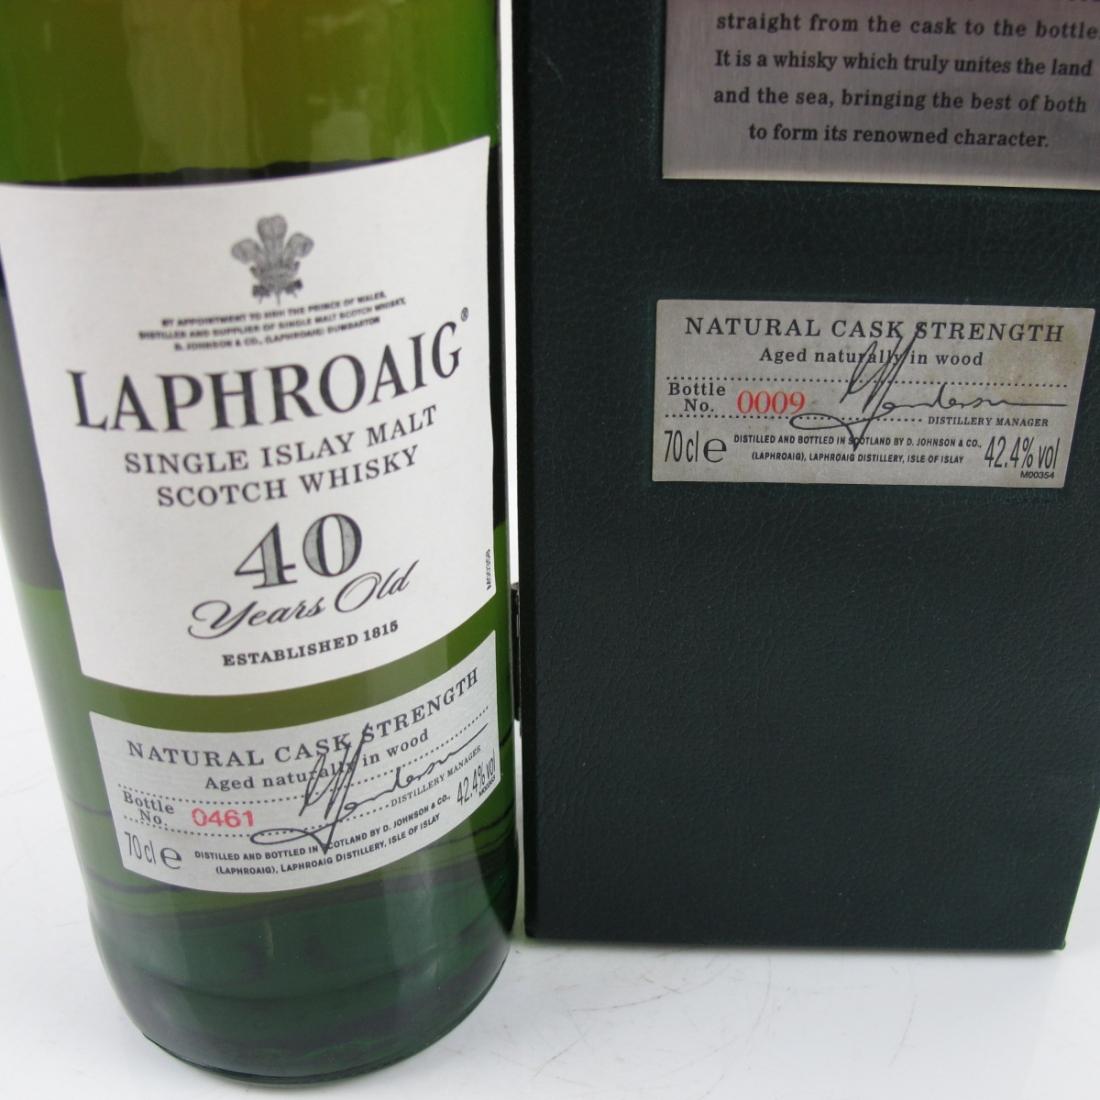 Laphroaig 40 Year Old